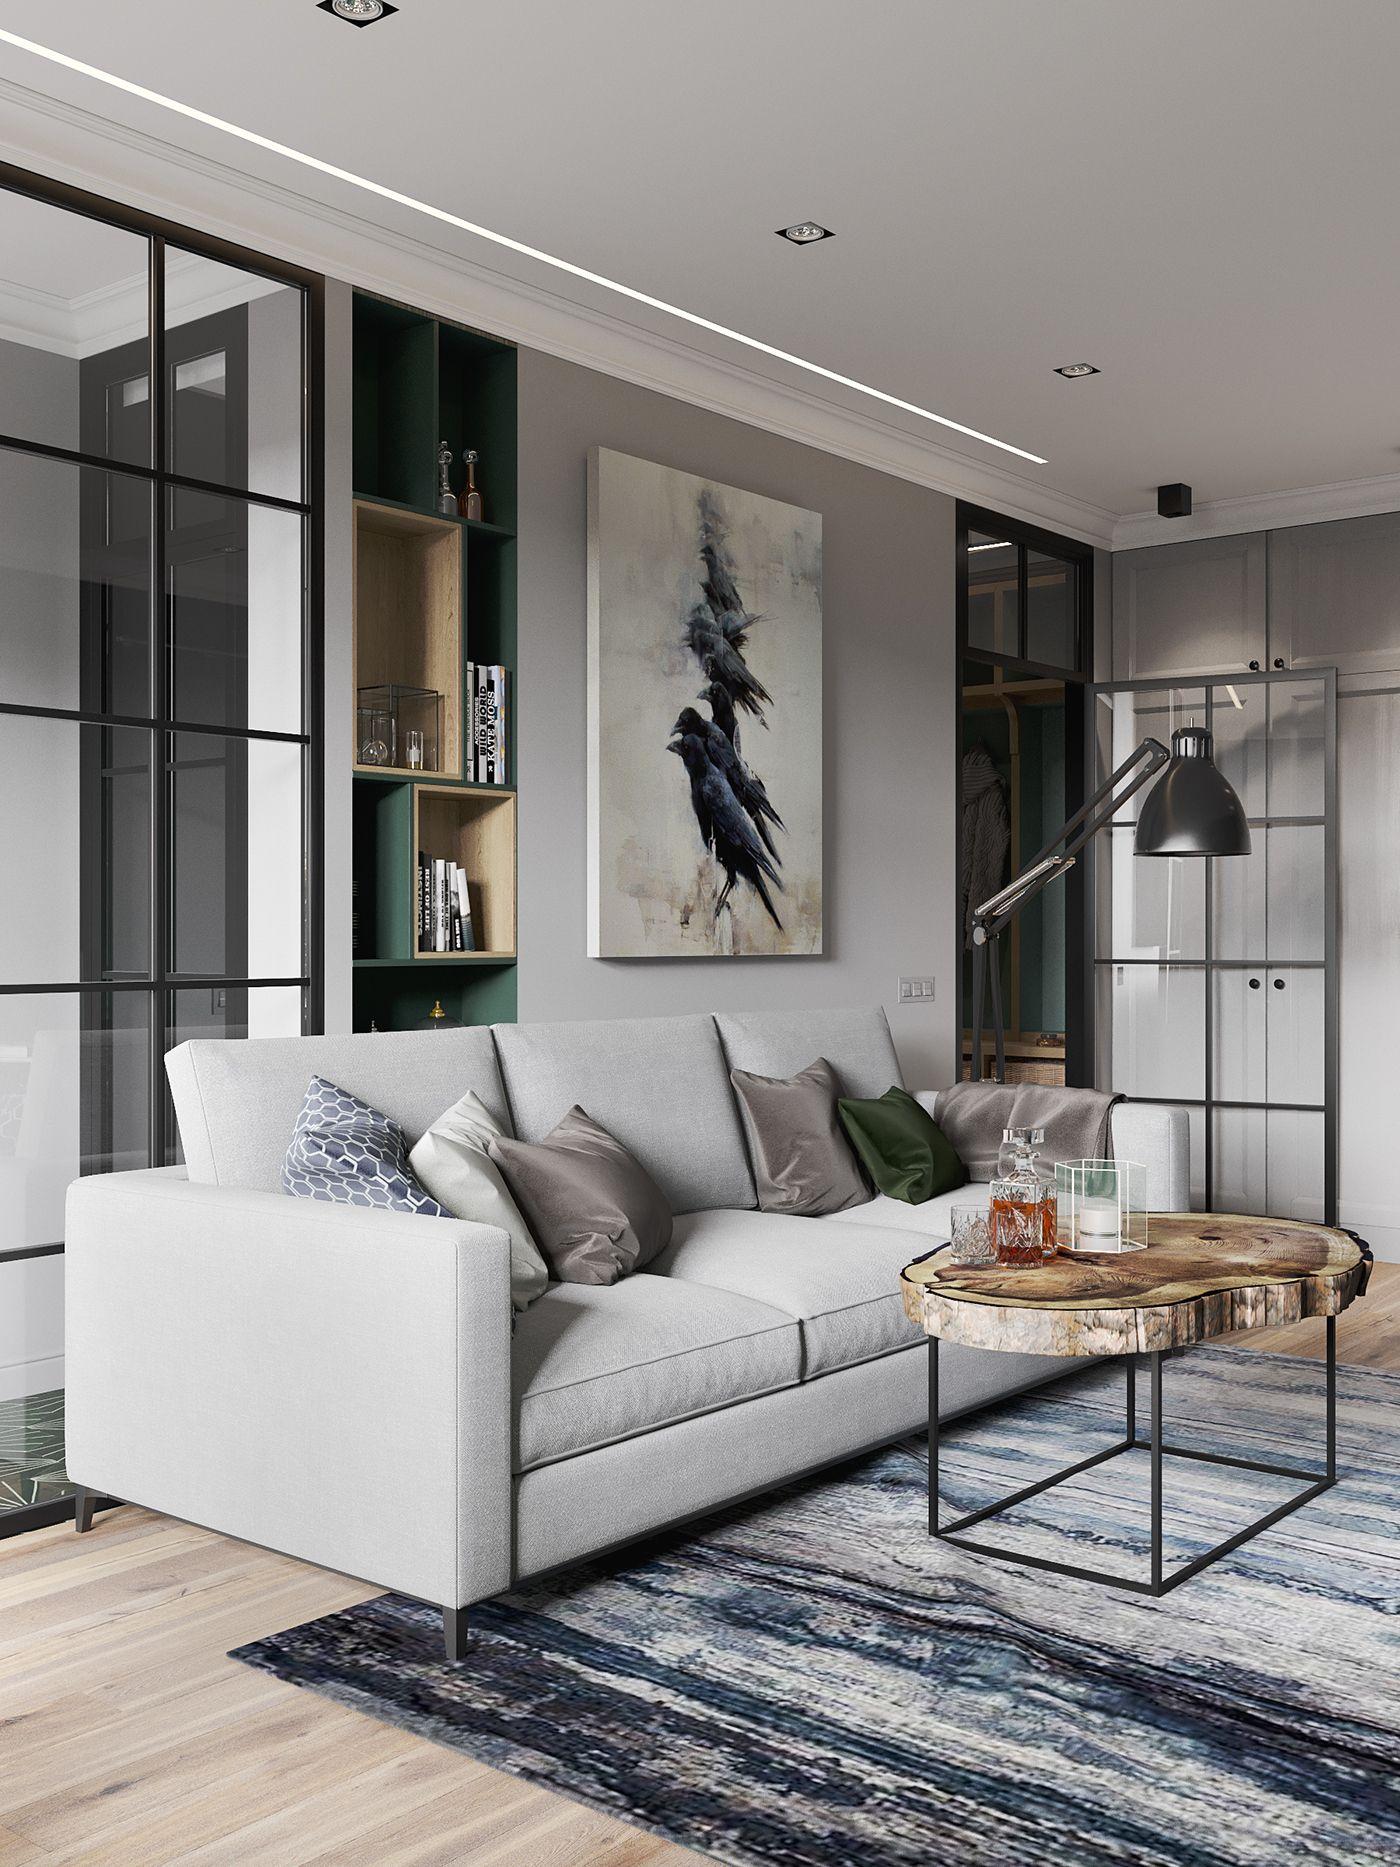 Cag luxury interior pinterest russian